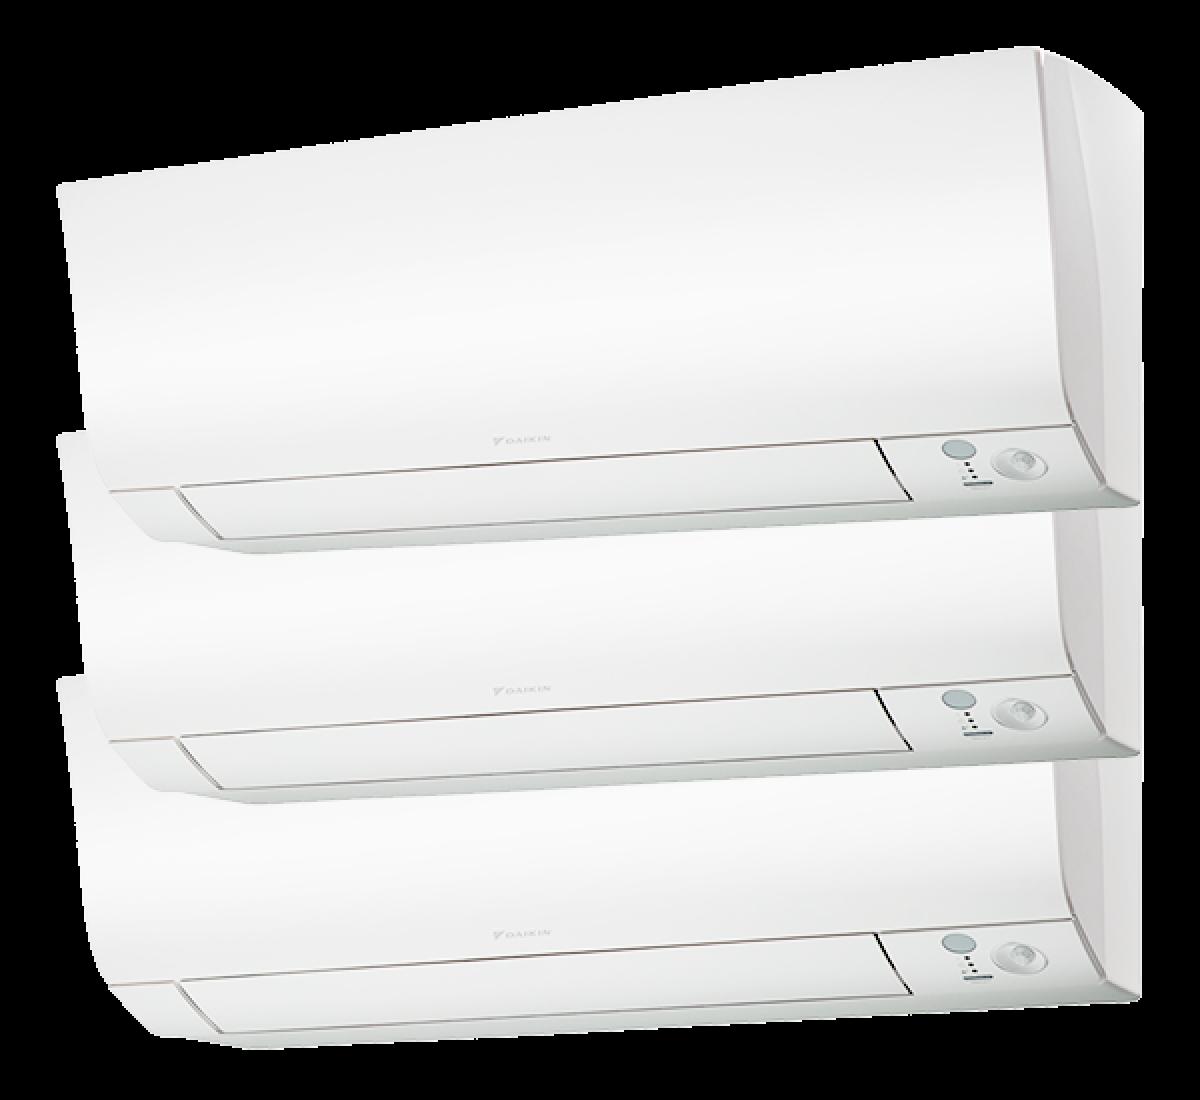 Multisplit Aire Acondicionado Equipo Interior Daikin Serie Comfora FTXM35-N+FTXM35-N+FTXM25-N